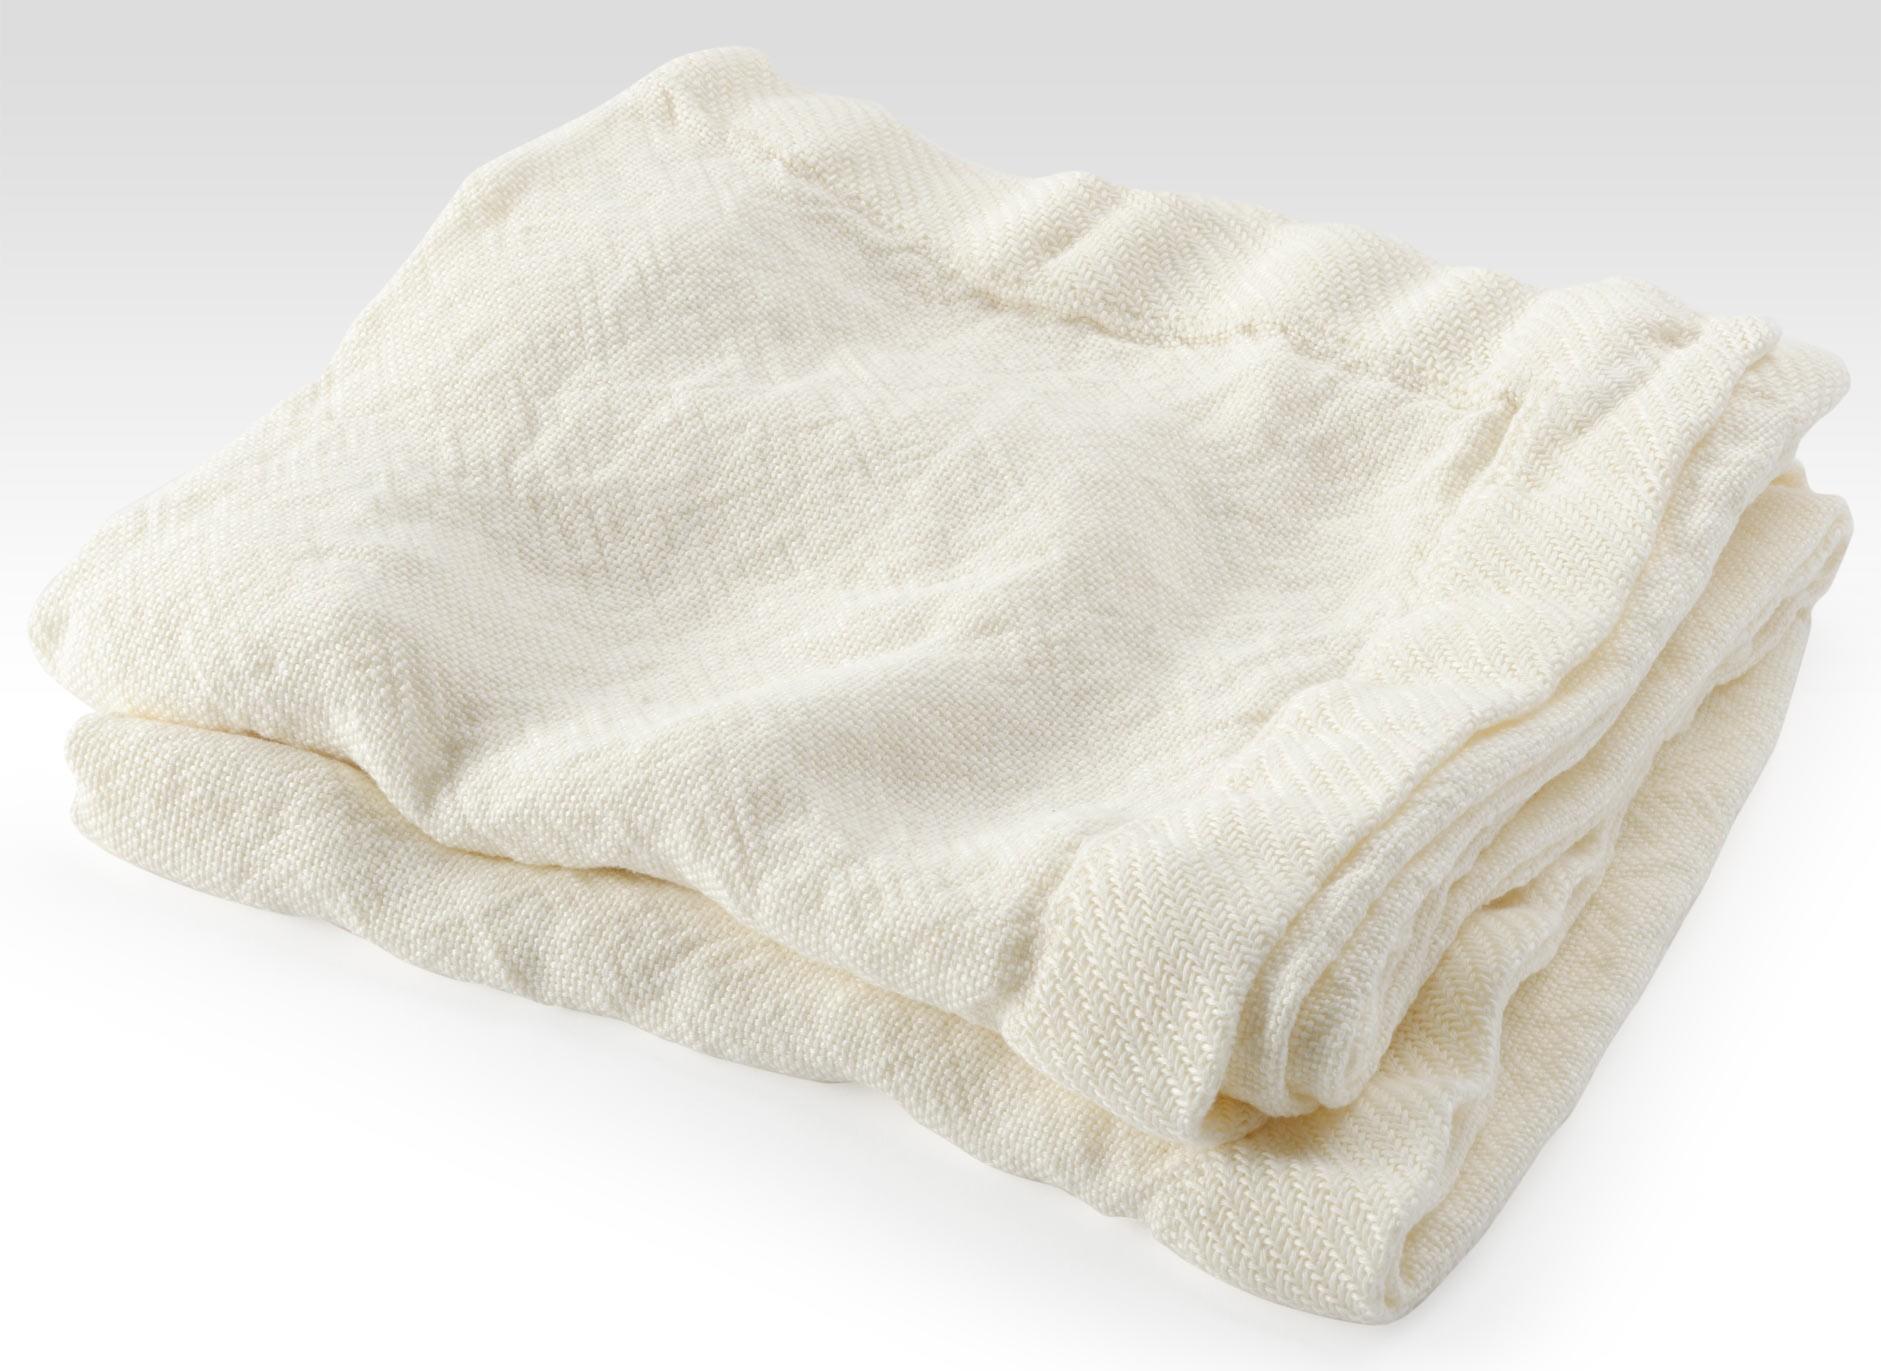 Cream Linen Flat Weave Throw